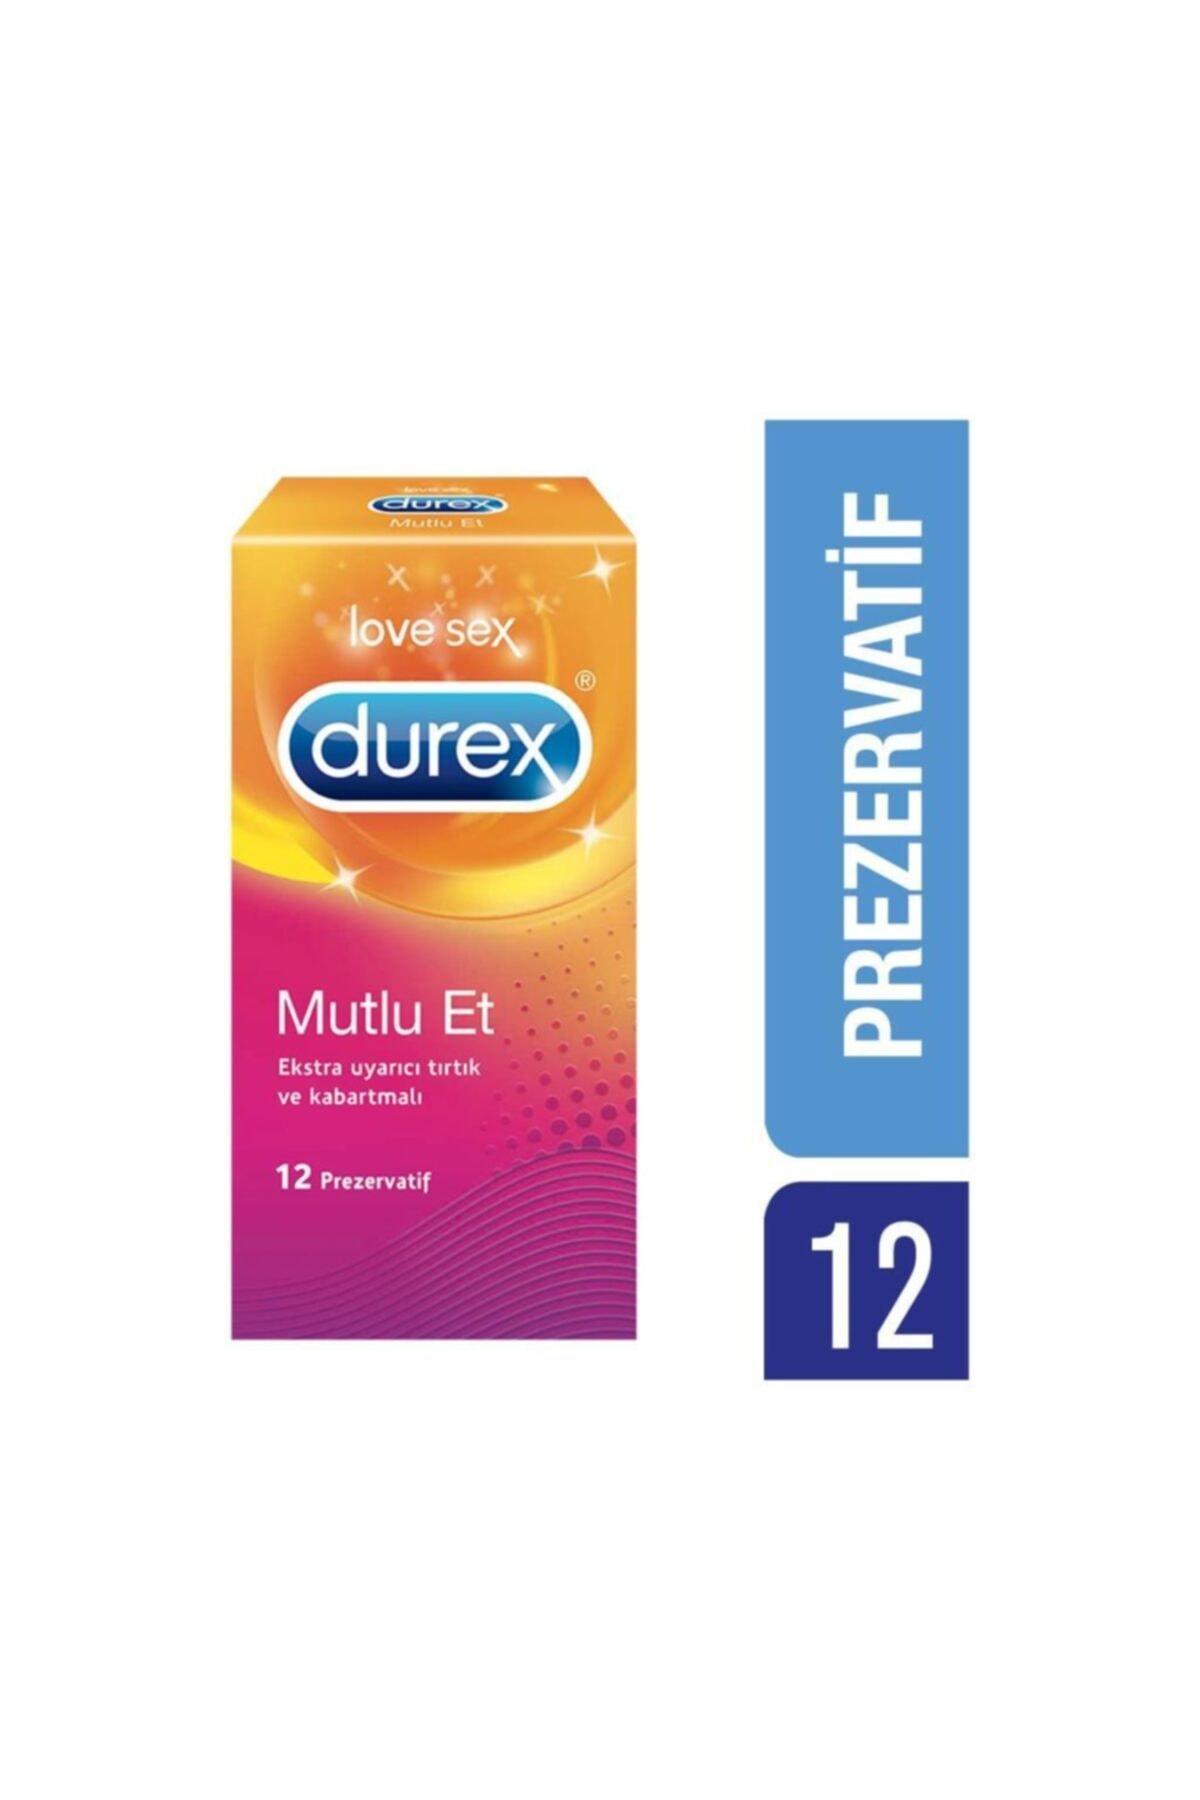 Durex Prezervatif Mutlu Et 12 Li 1